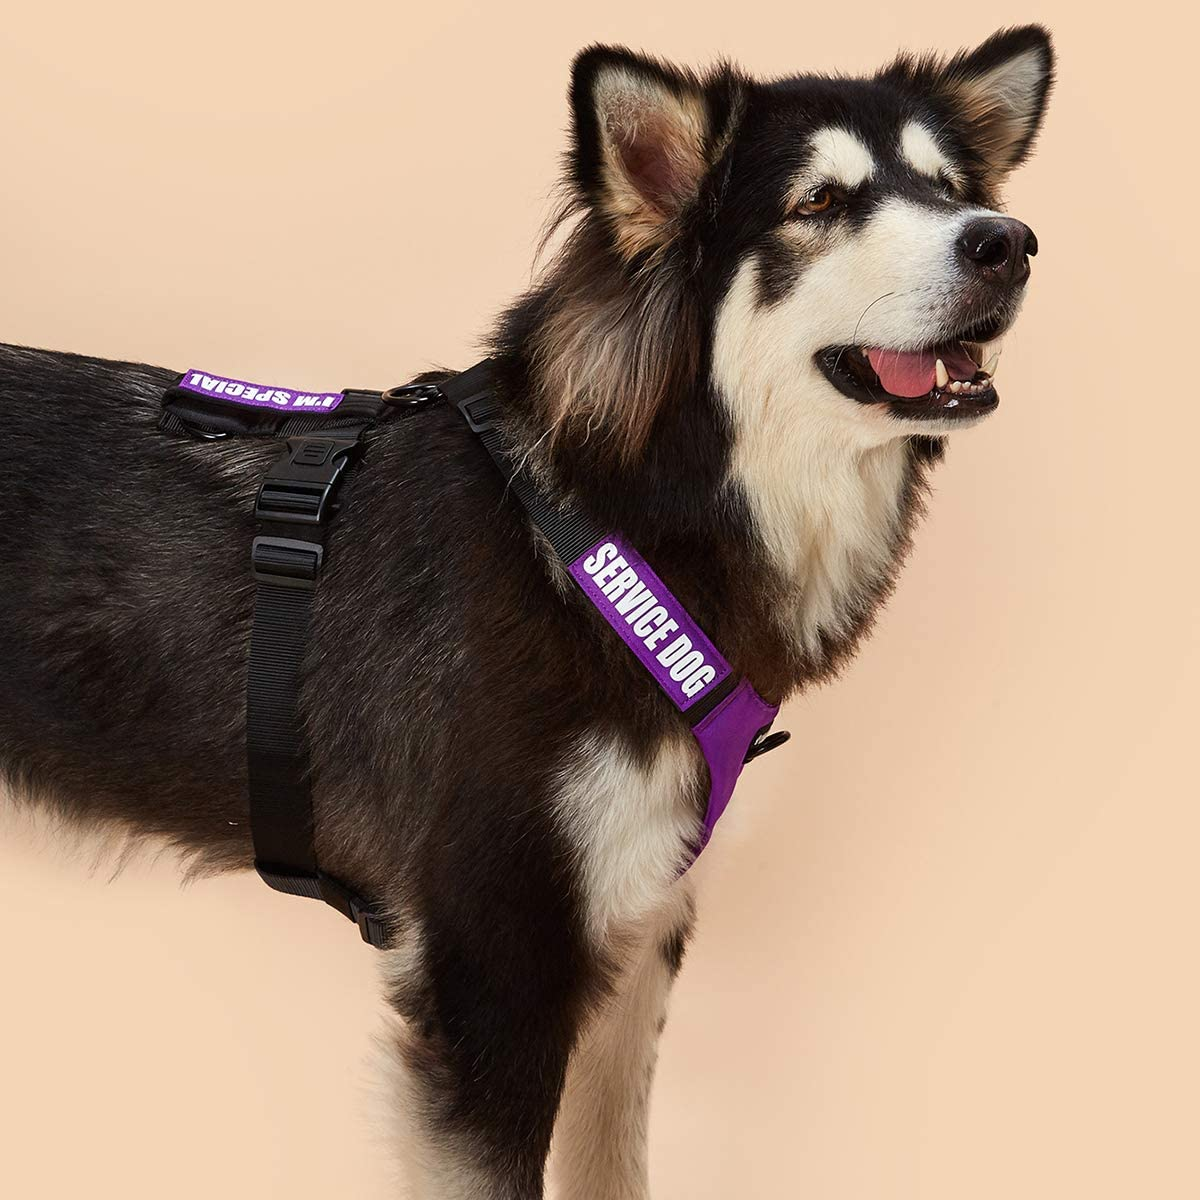 Active No Pull Tactical Training Dog Harness Dihapet Service Dog Harness Adjustable Puppy Small Medium Large Dog Vest